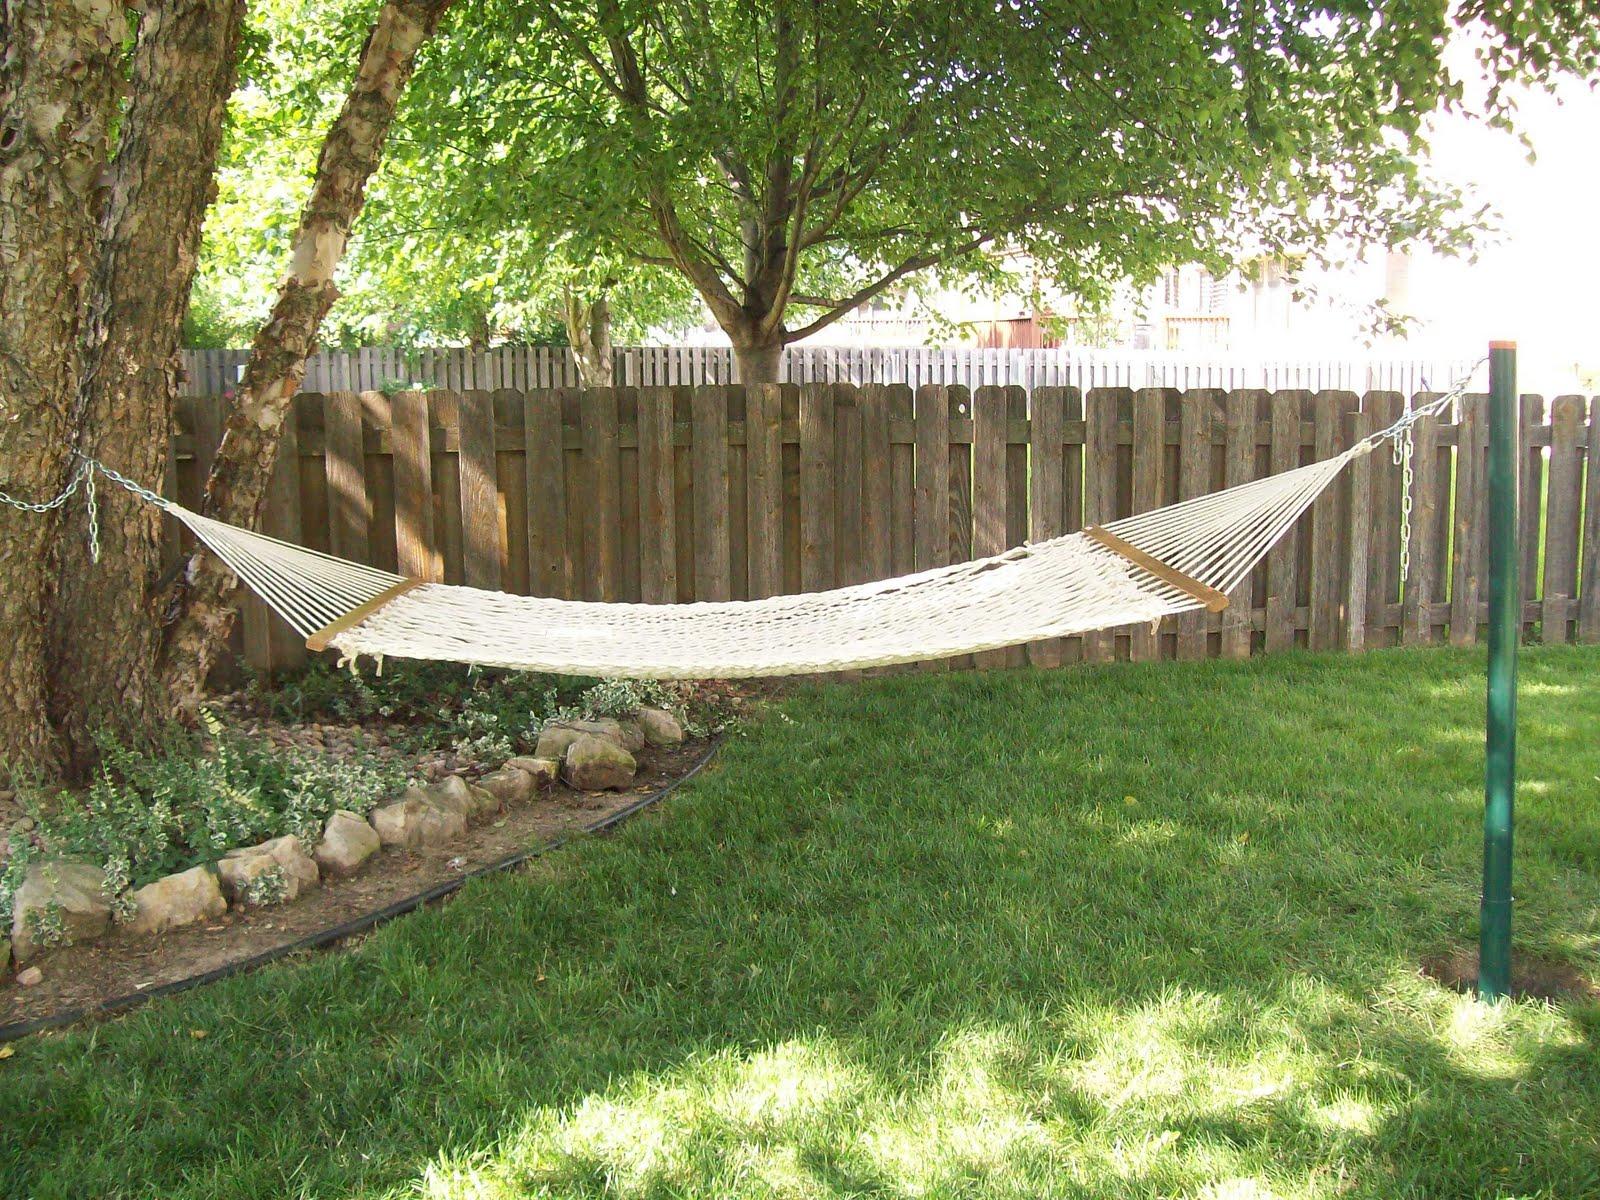 Backyard Hammock Setup :  one giant tree in my backyard, how can i set up a hammock? (srs) reps